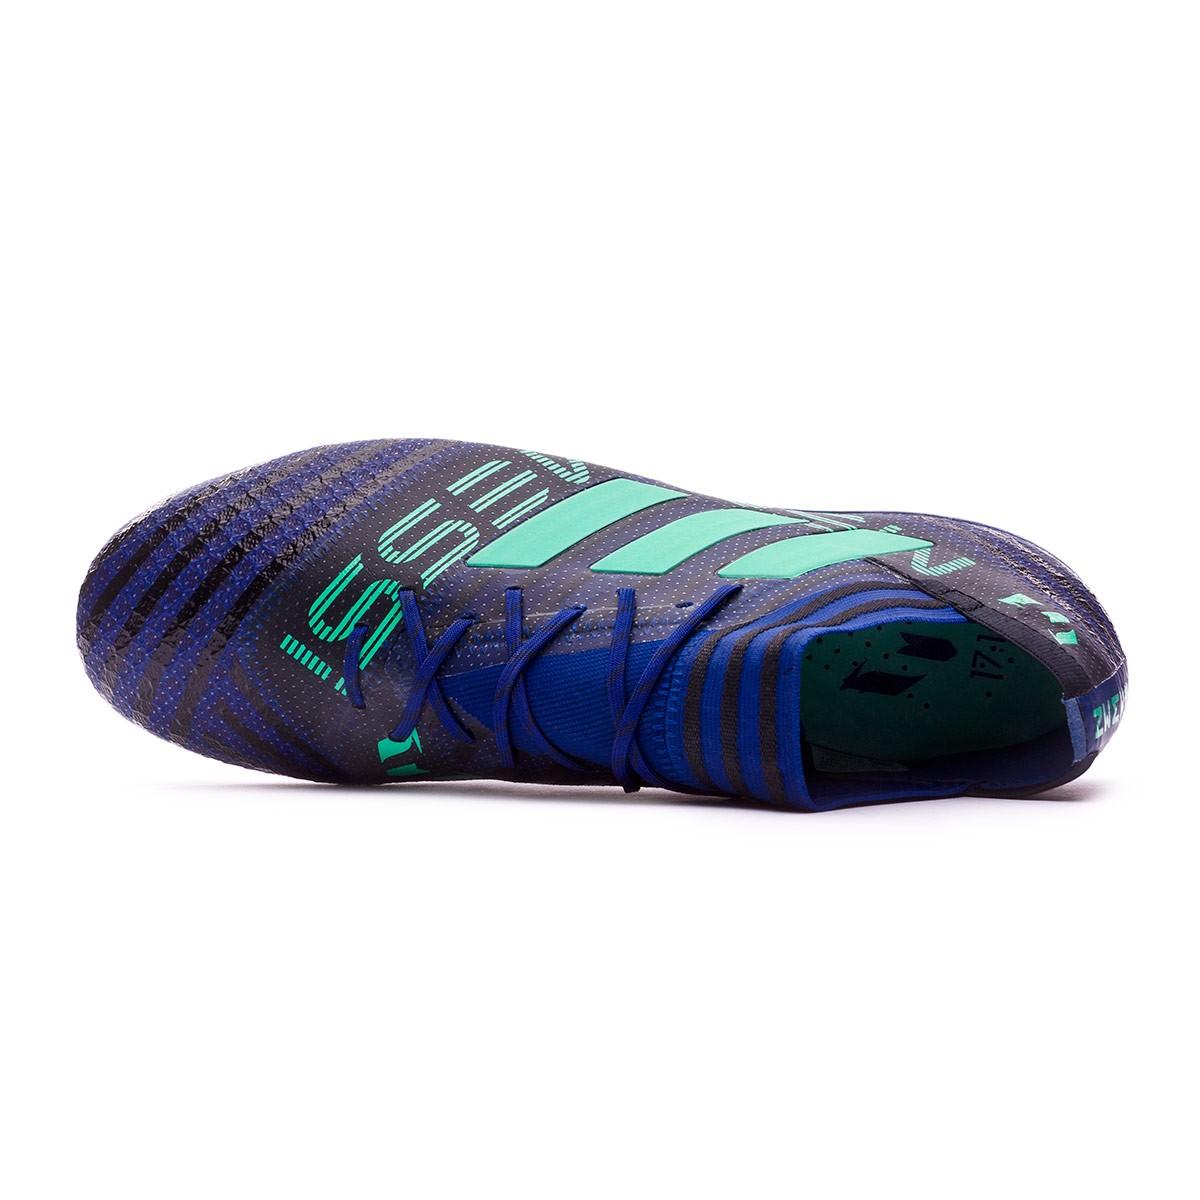 size 40 0f875 6b4e6 Zapatos de fútbol adidas Nemeziz Messi 17.1 FG Unity ink-Hi-res green-Core  black - Tienda de fútbol Fútbol Emotion